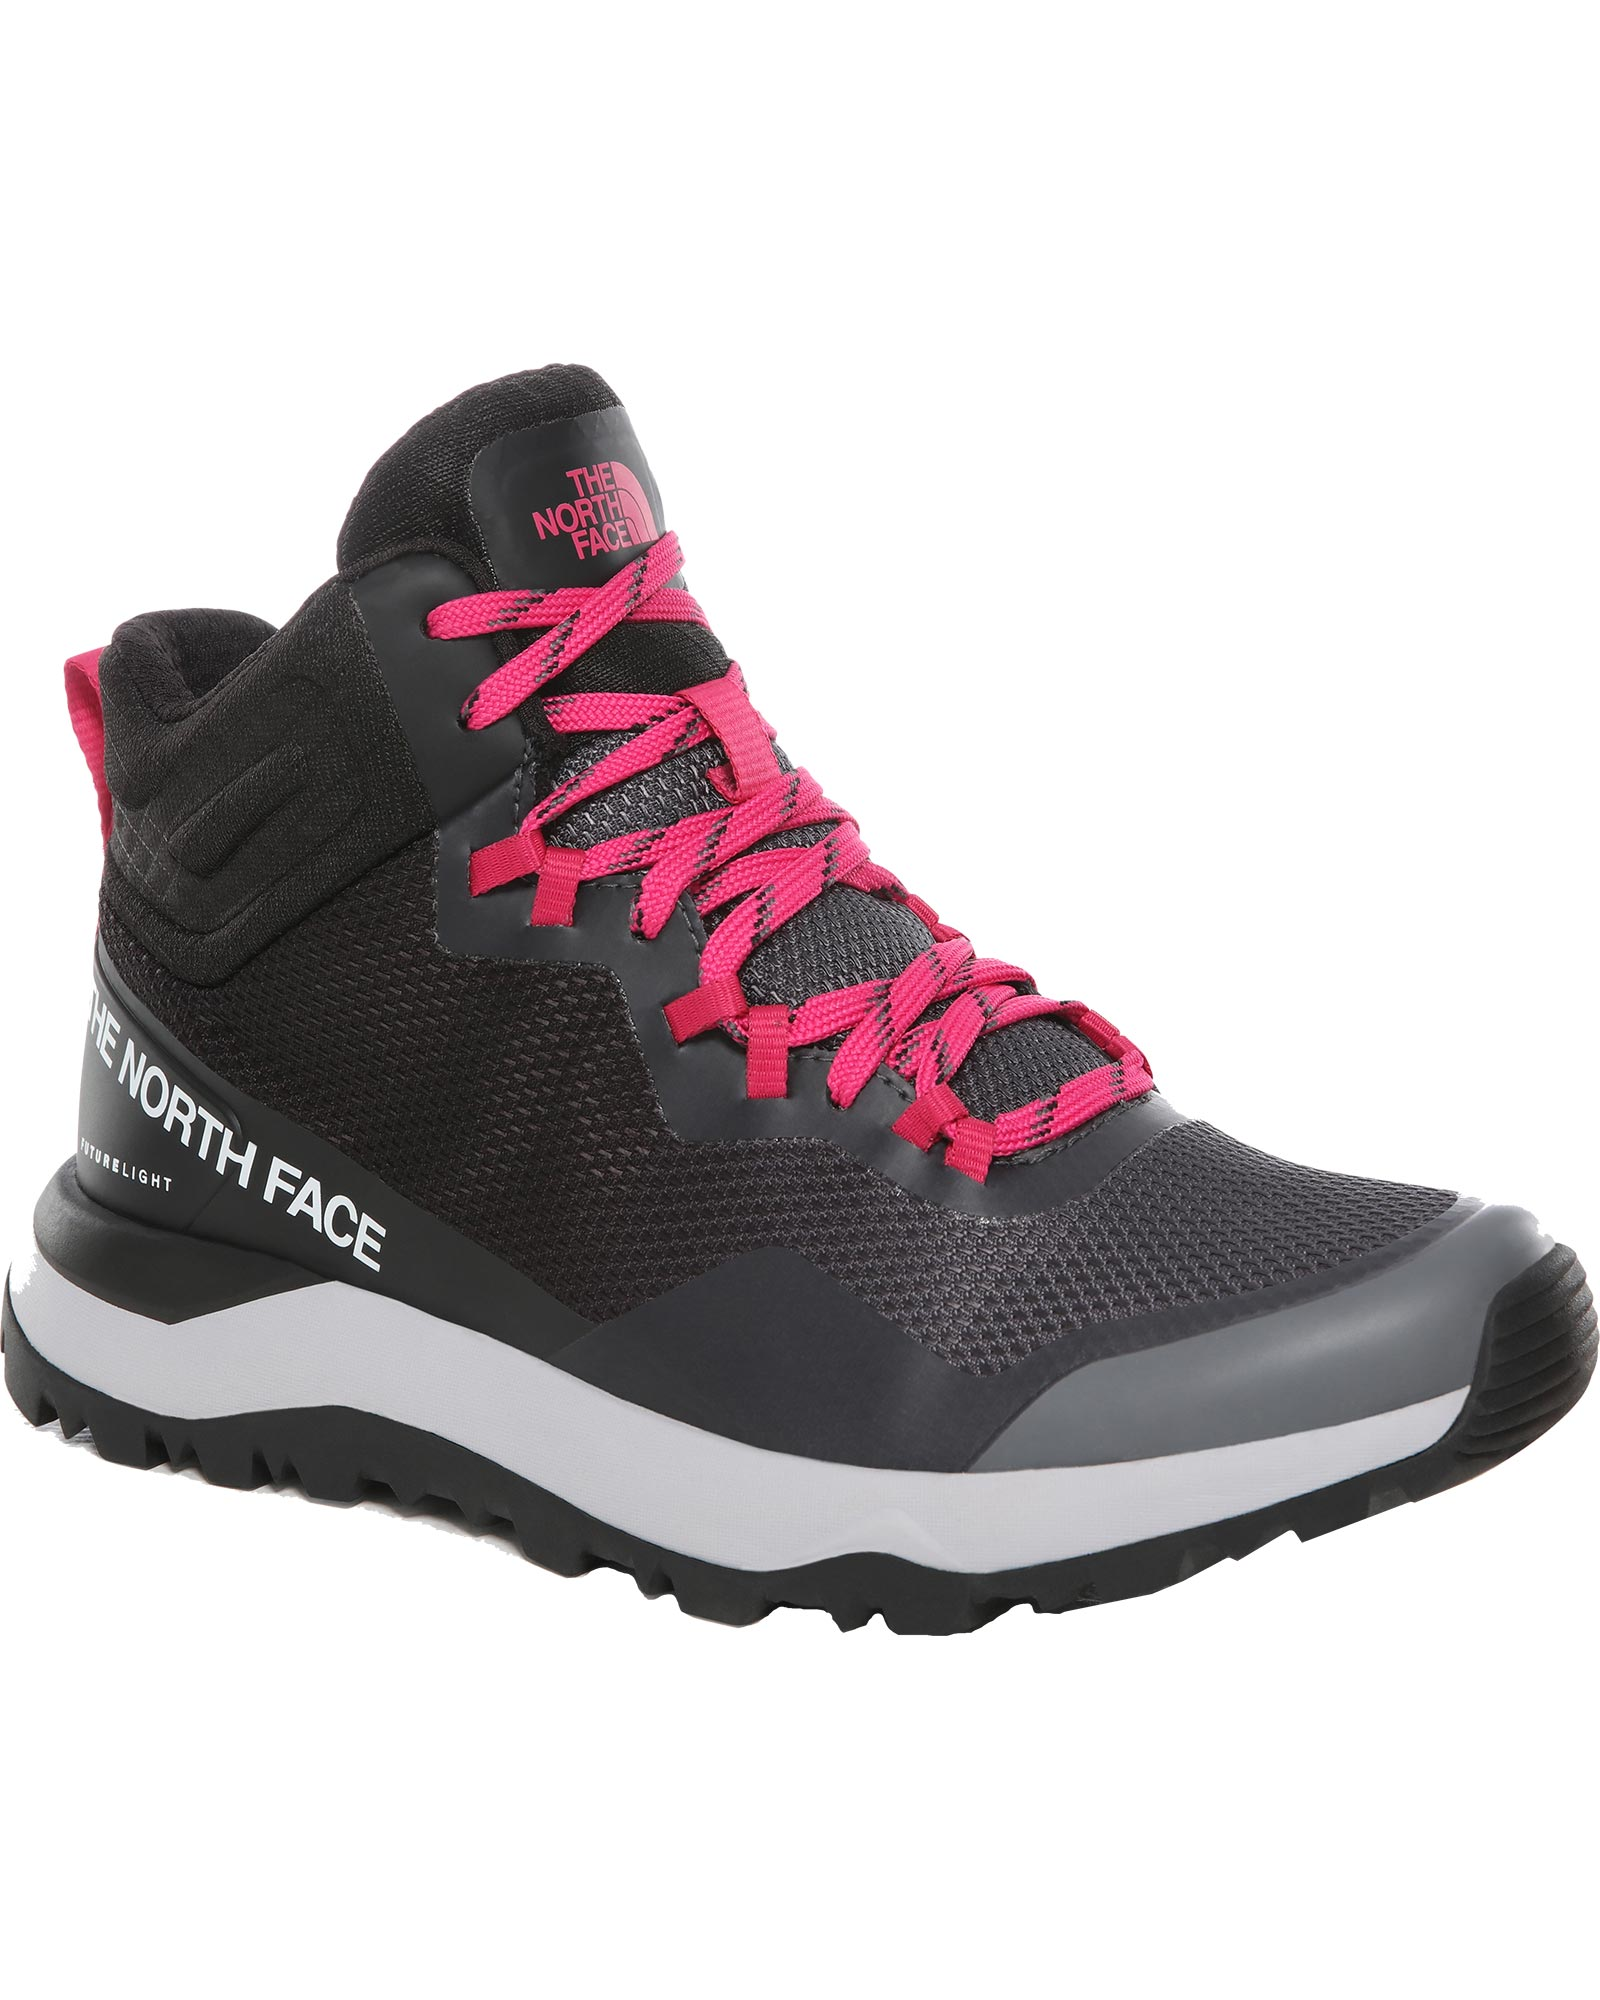 The North Face Women's Activist FUTURELIGHT Mid Walking Boots 0